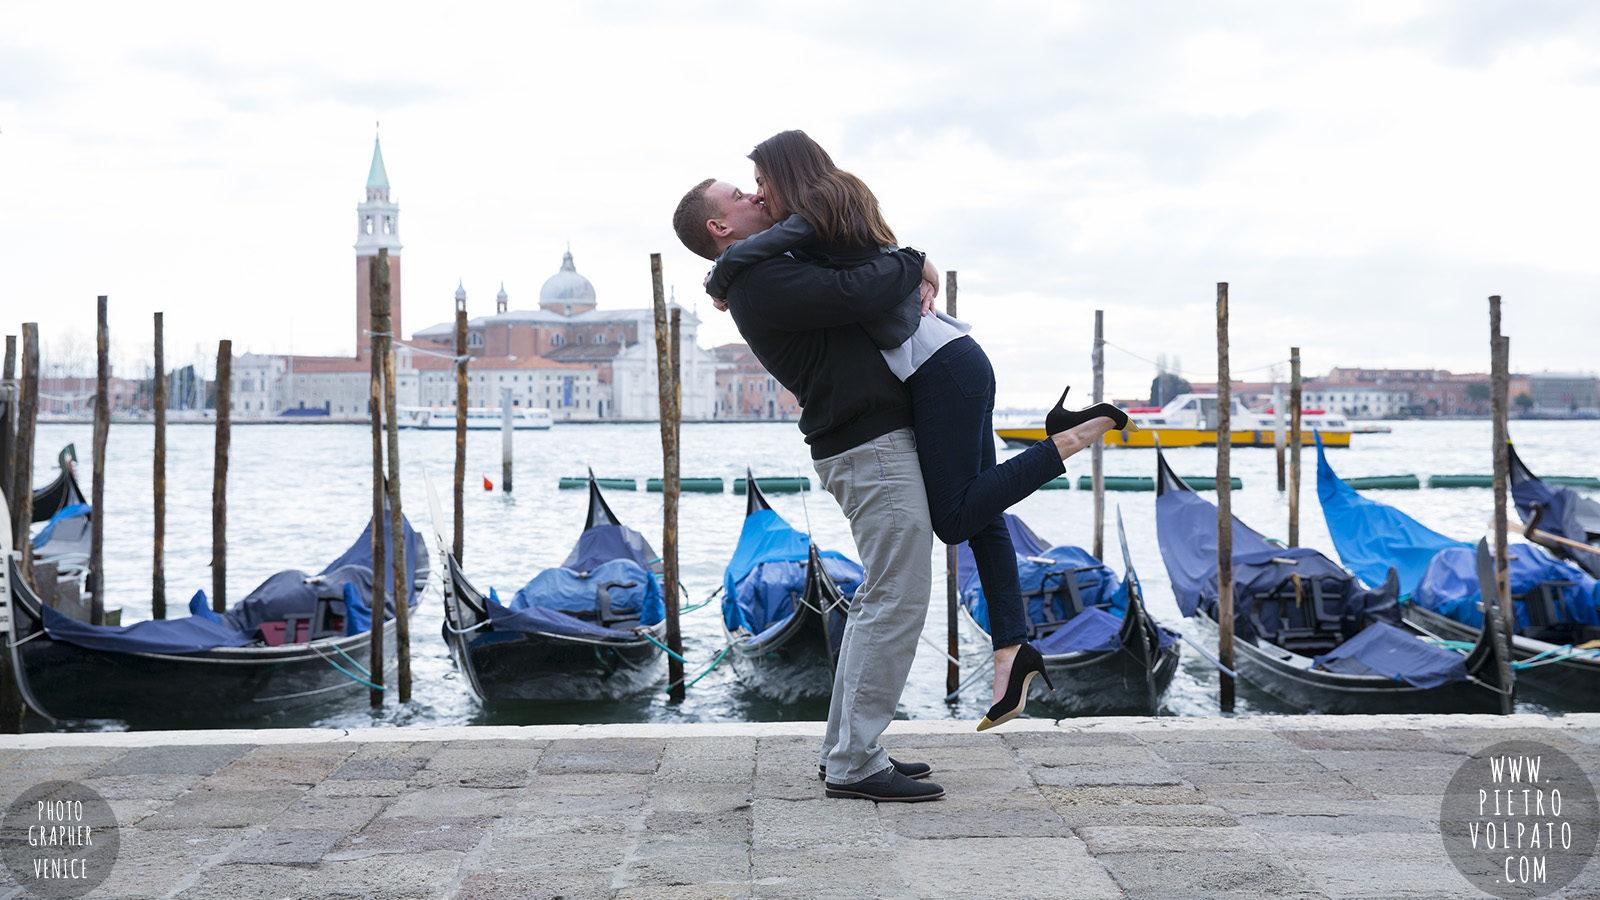 pre-wedding-love-story-photoshoot-in-venice-italy-photographer-pietro-volpato-20161229_10